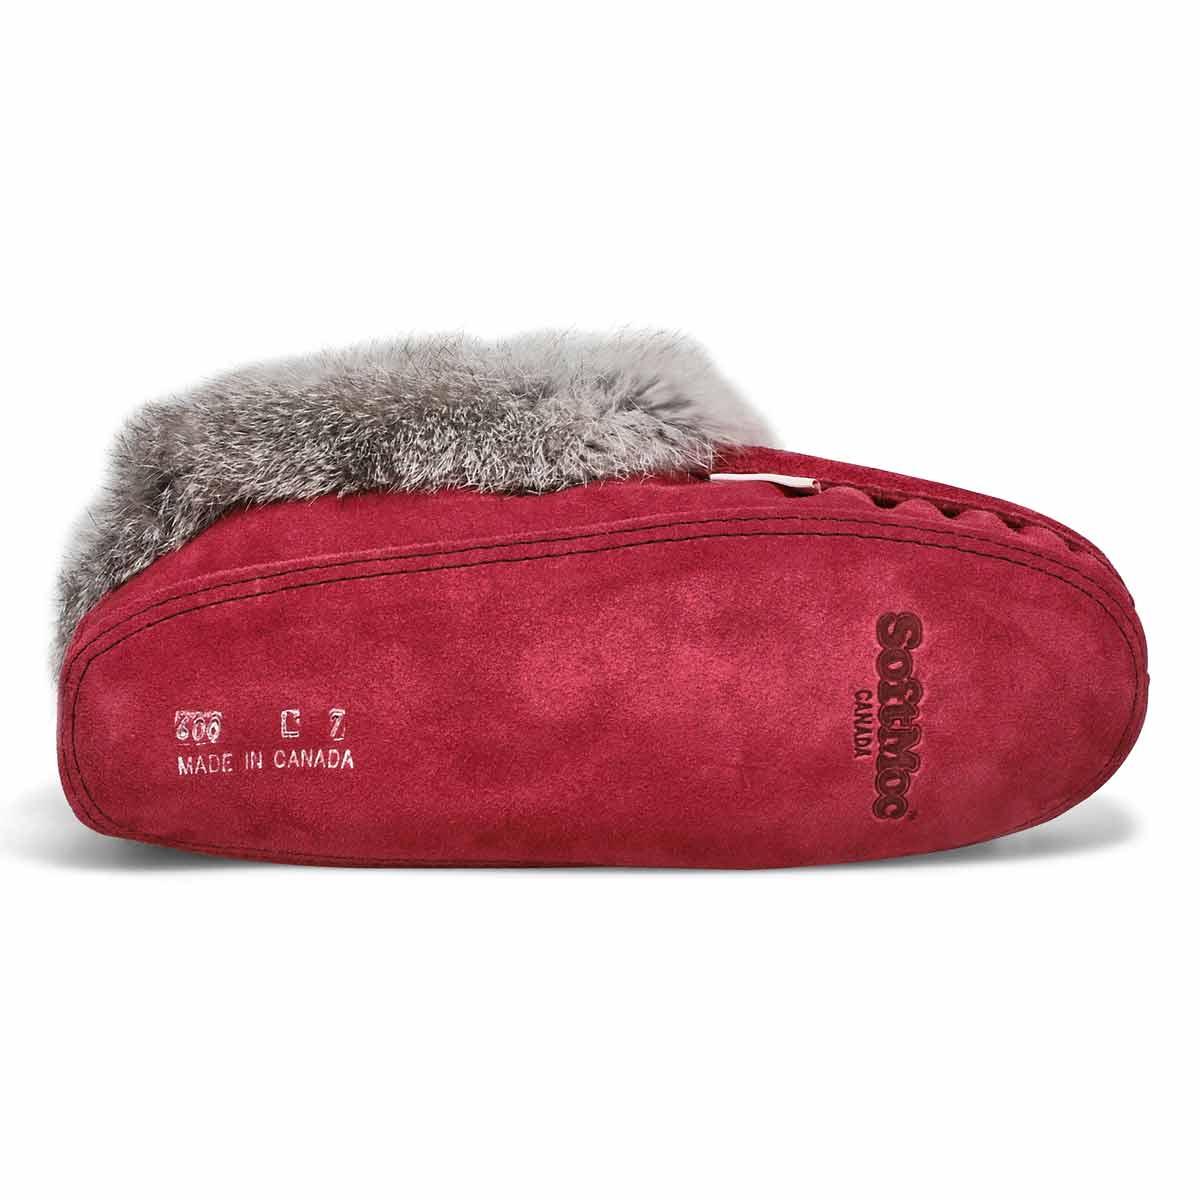 Women's SF600-BUL Rabbit Fur Moccasin - Burgandy